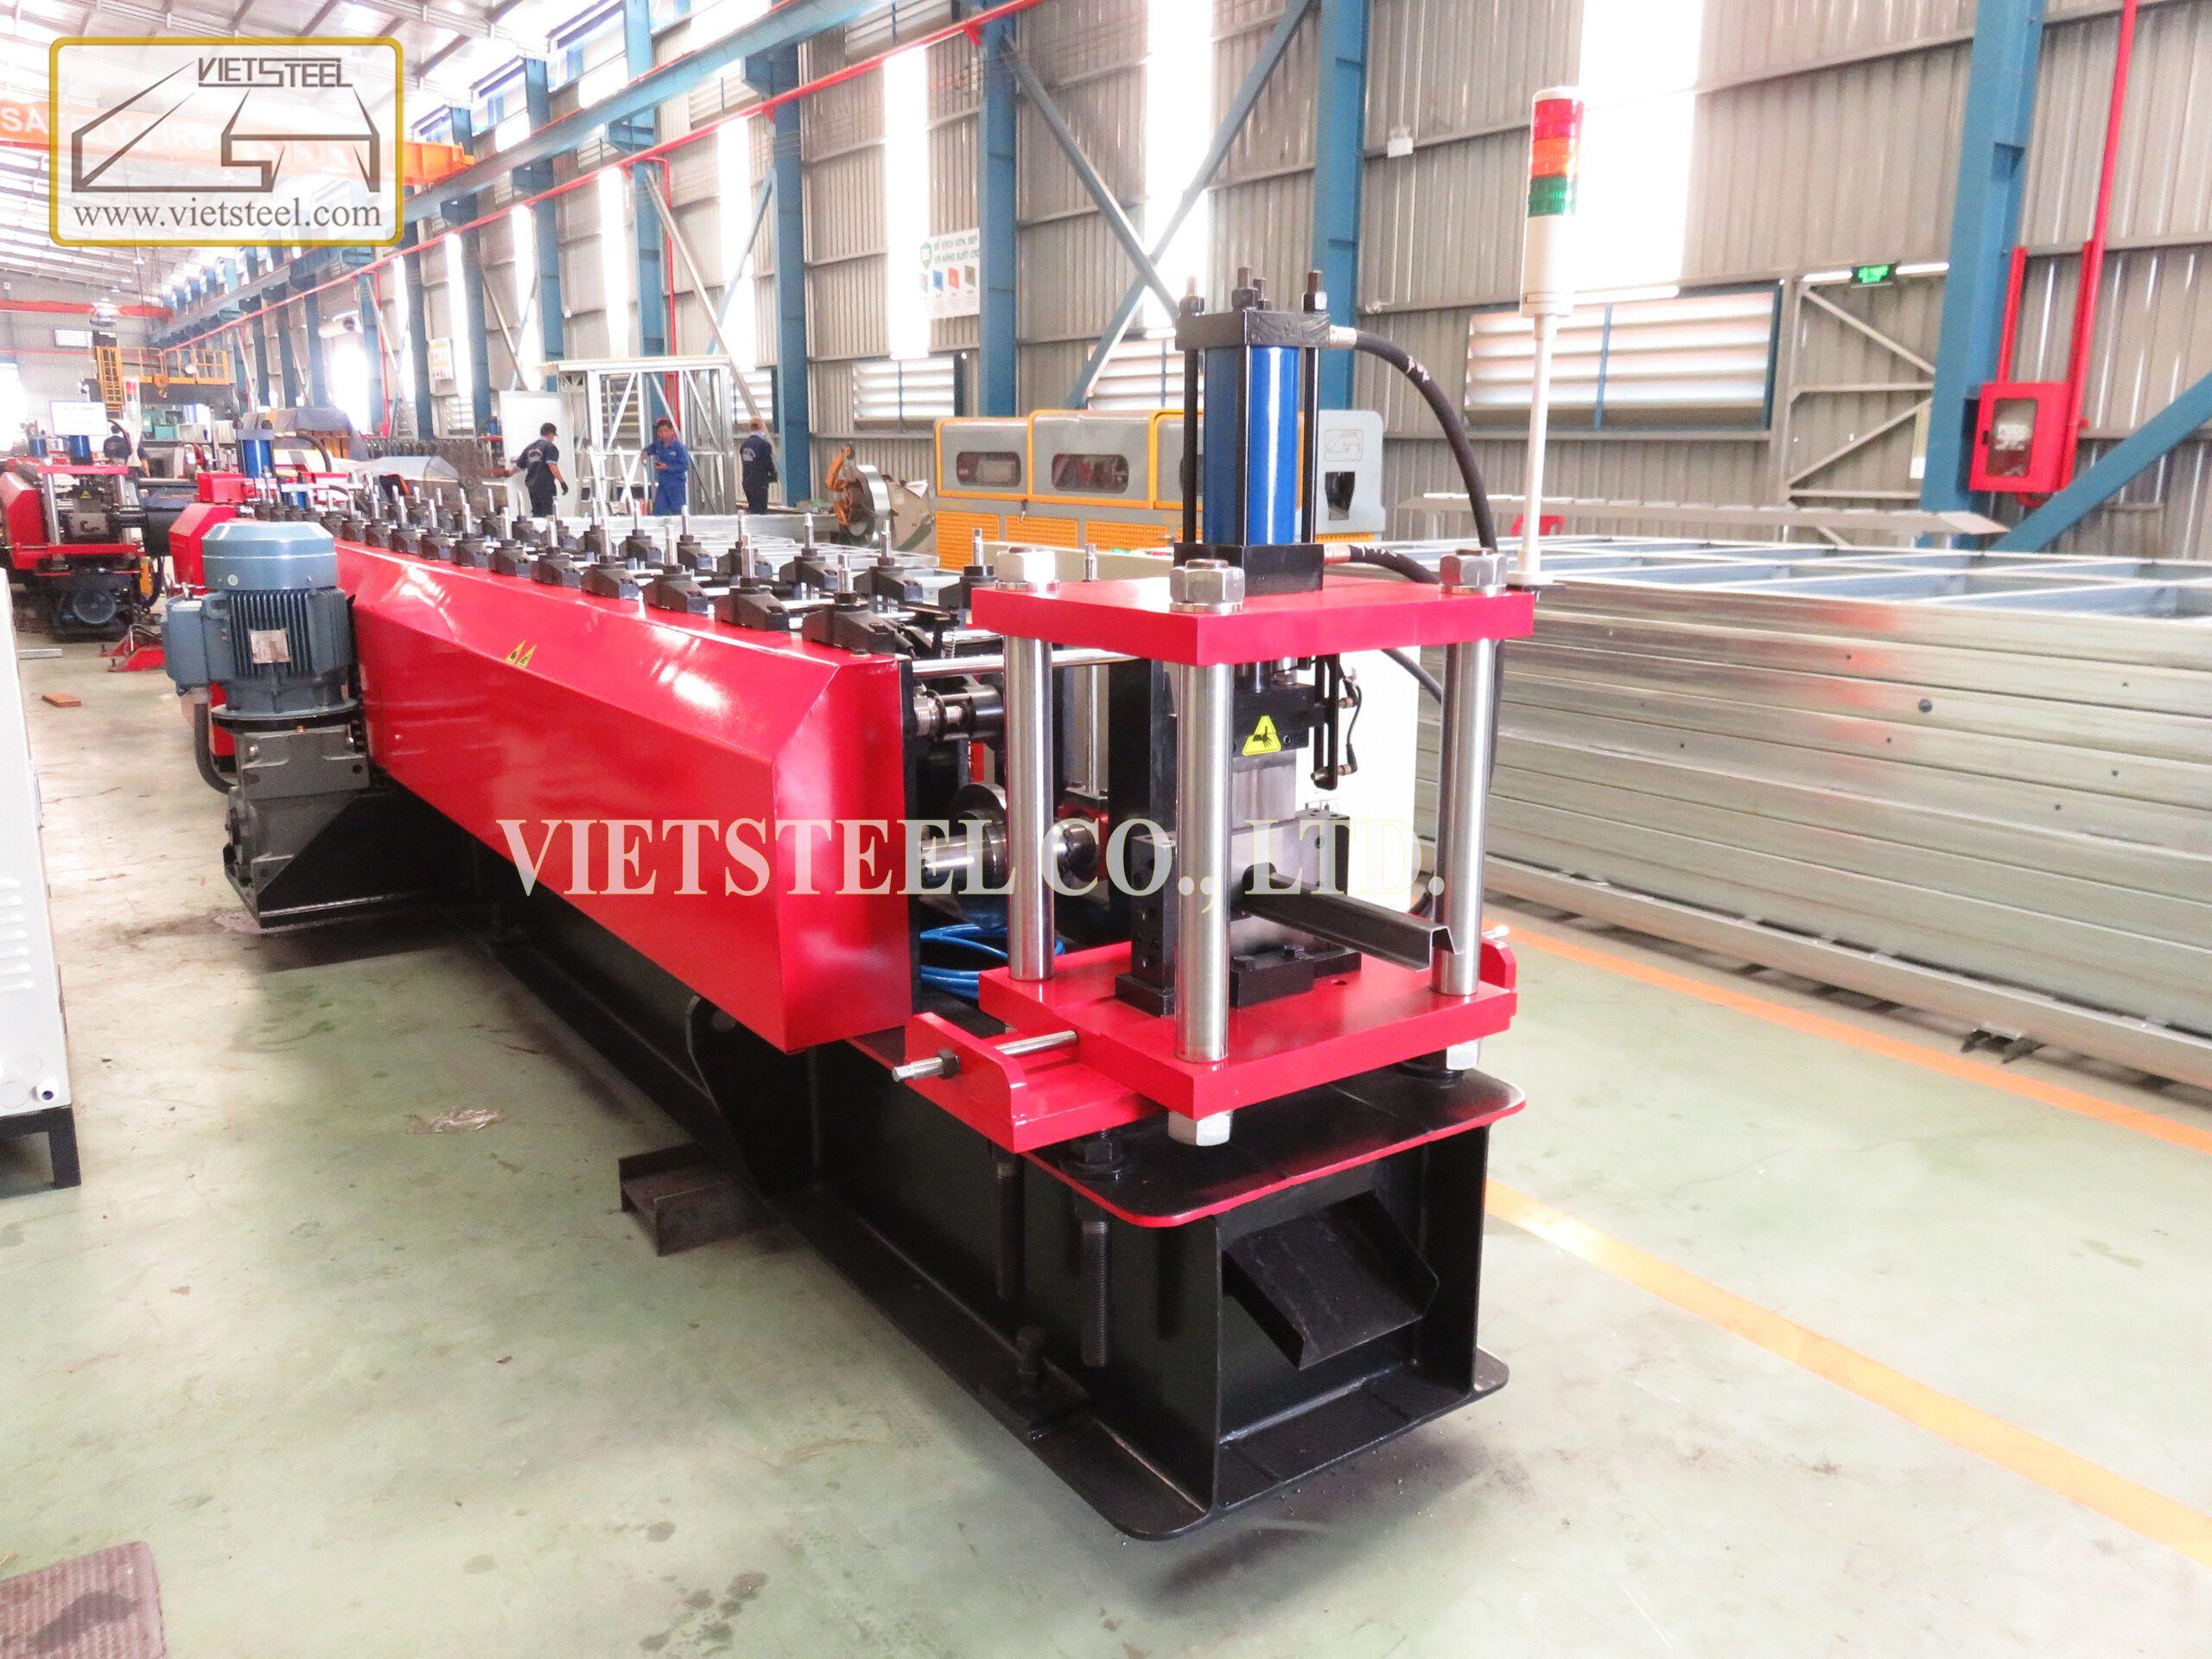 Vietsteel Truck side mounting roll forming machine – Underneath bar